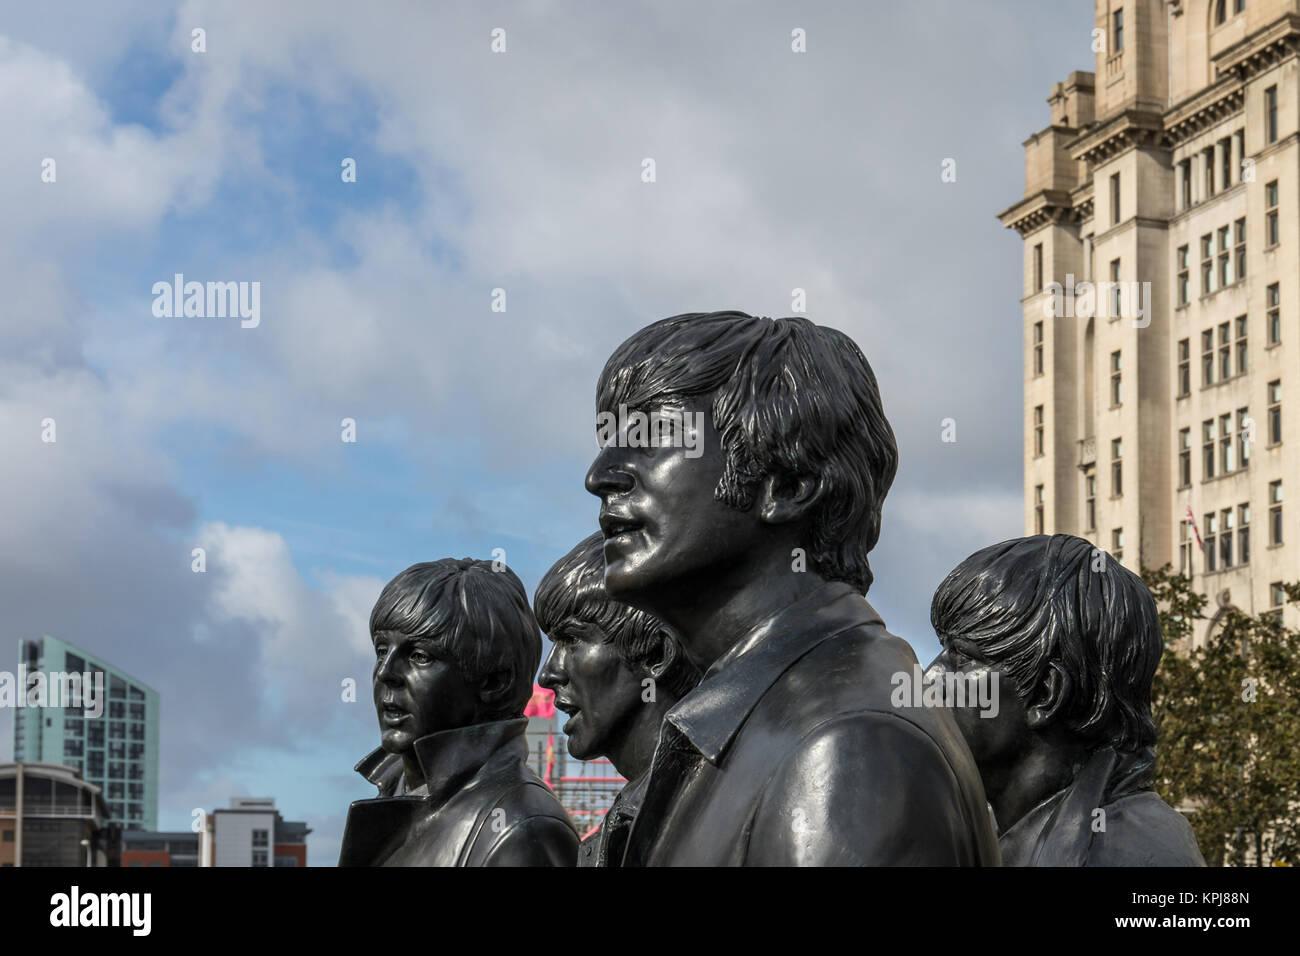 The Beatles statue detail, Pier Head, Liverpool, UK - Stock Image